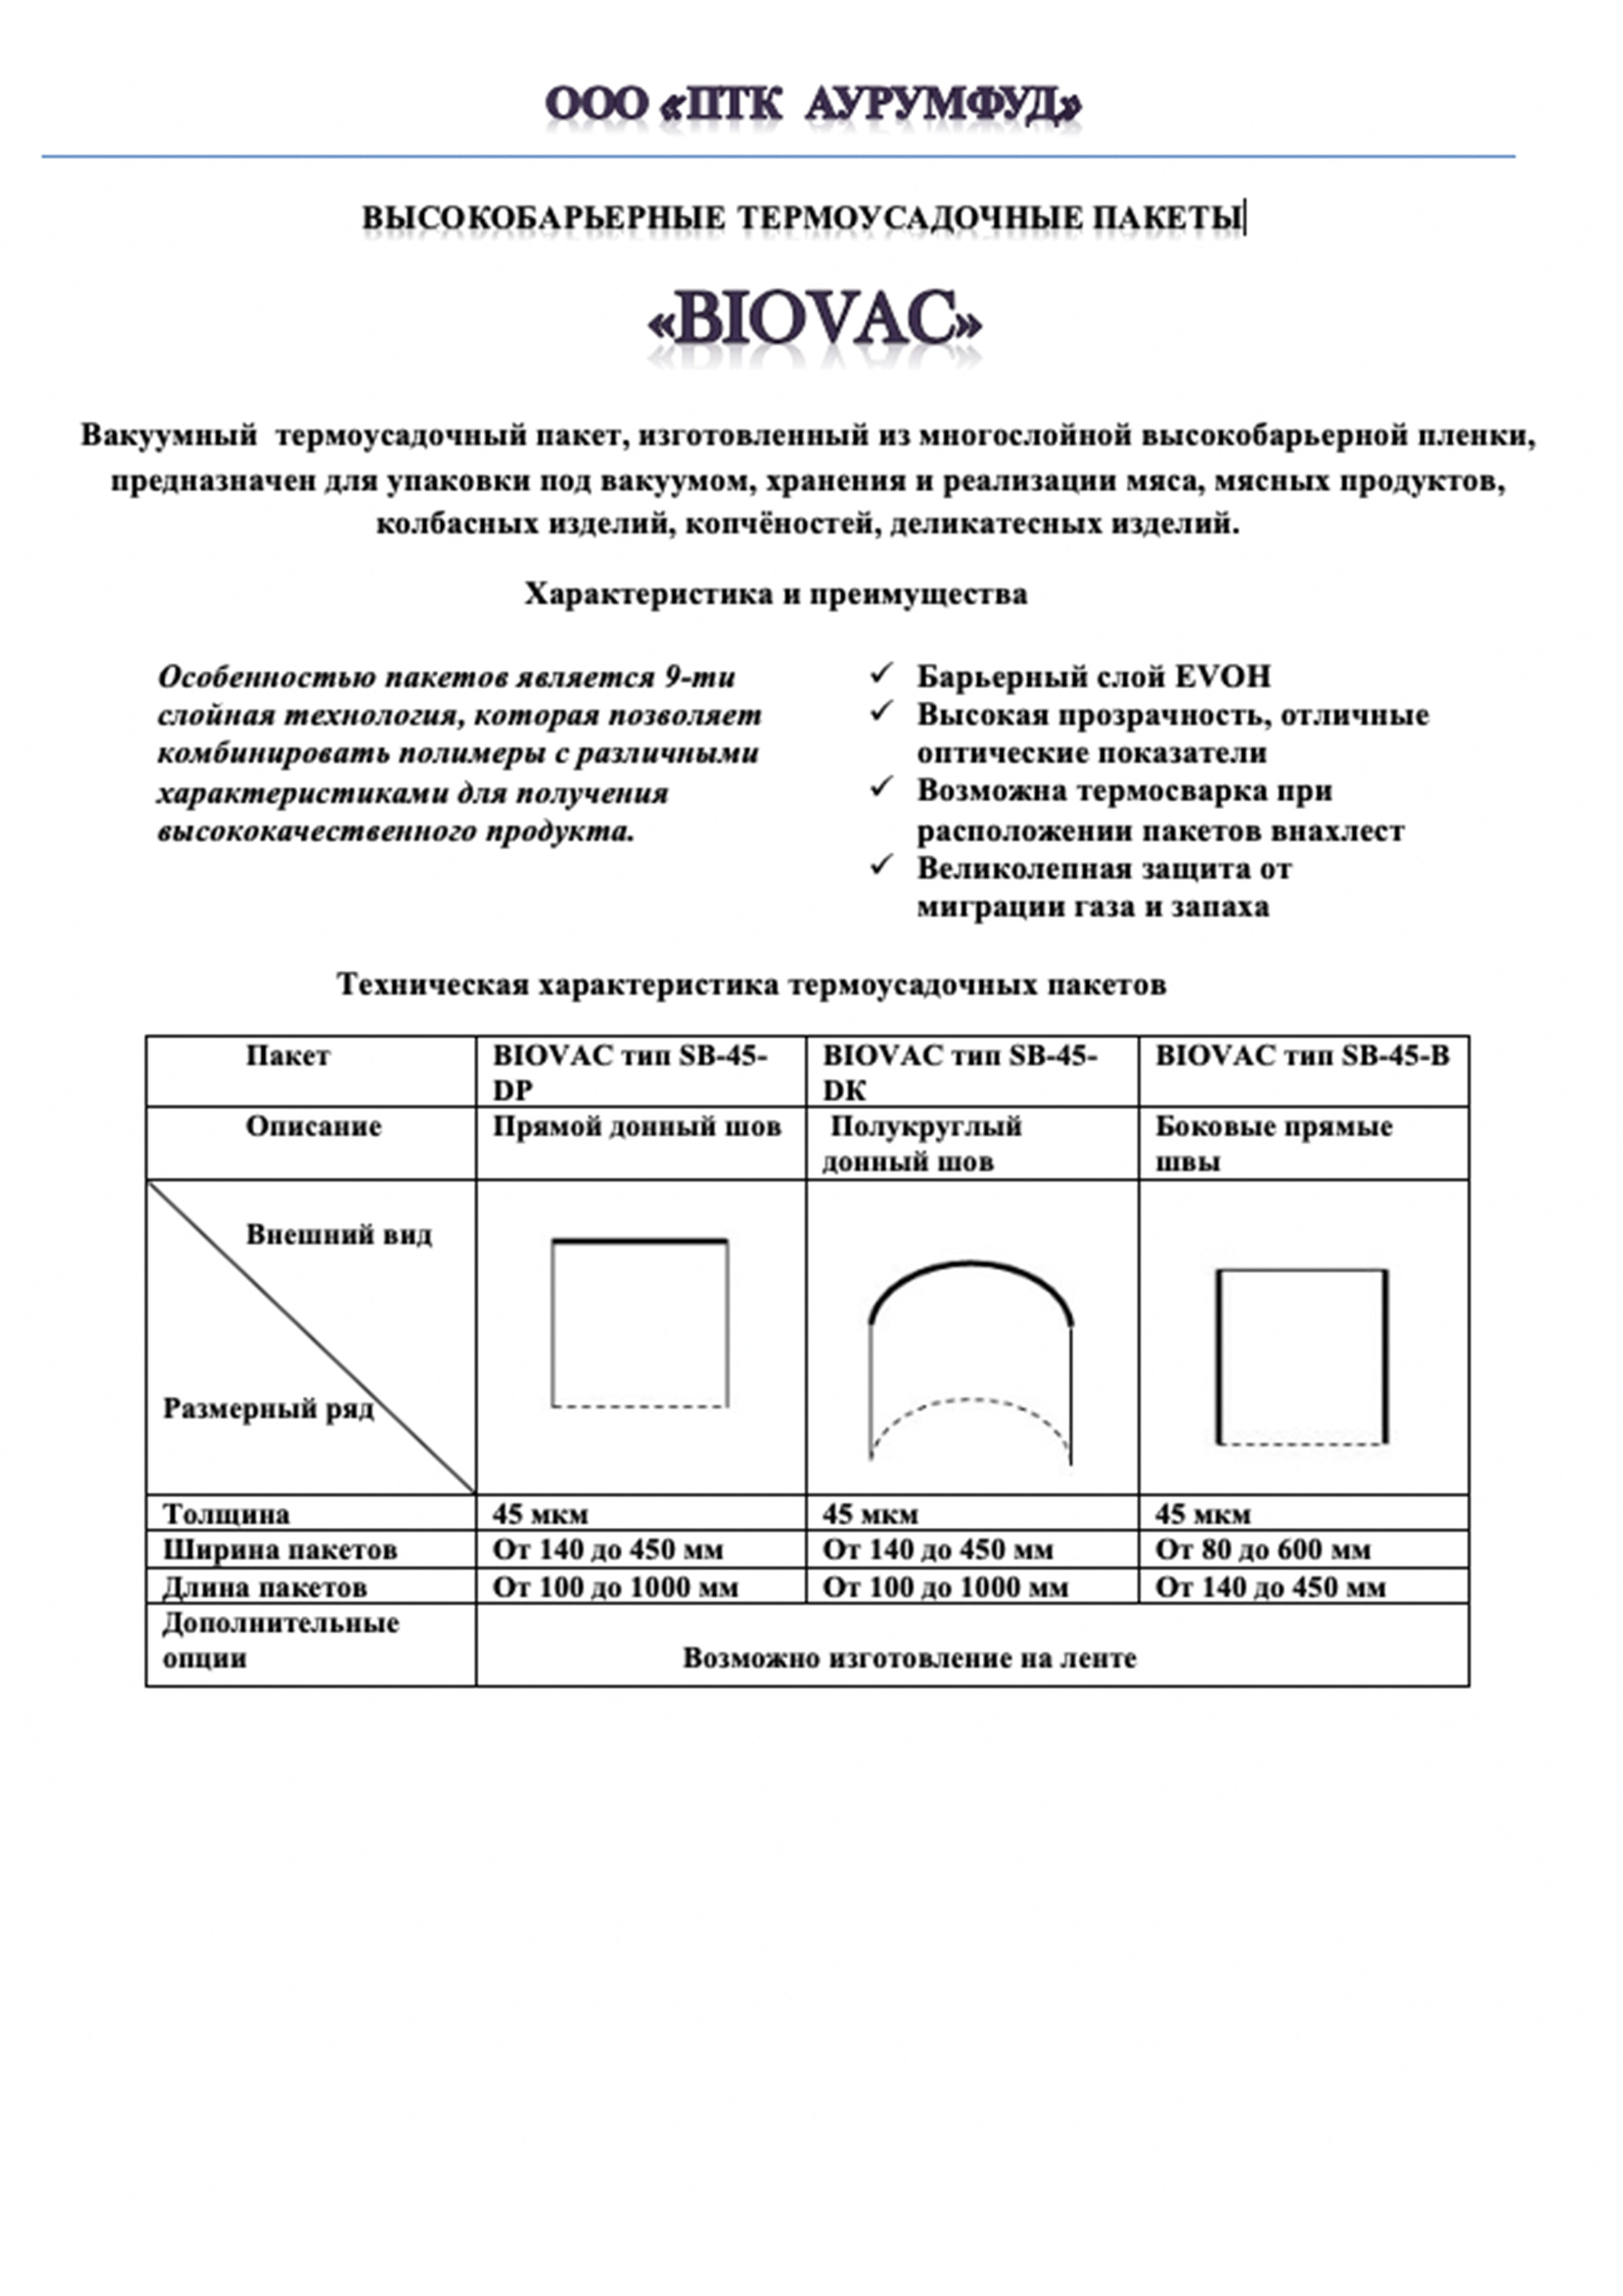 BIOVAC SB 45 Тех инструкции